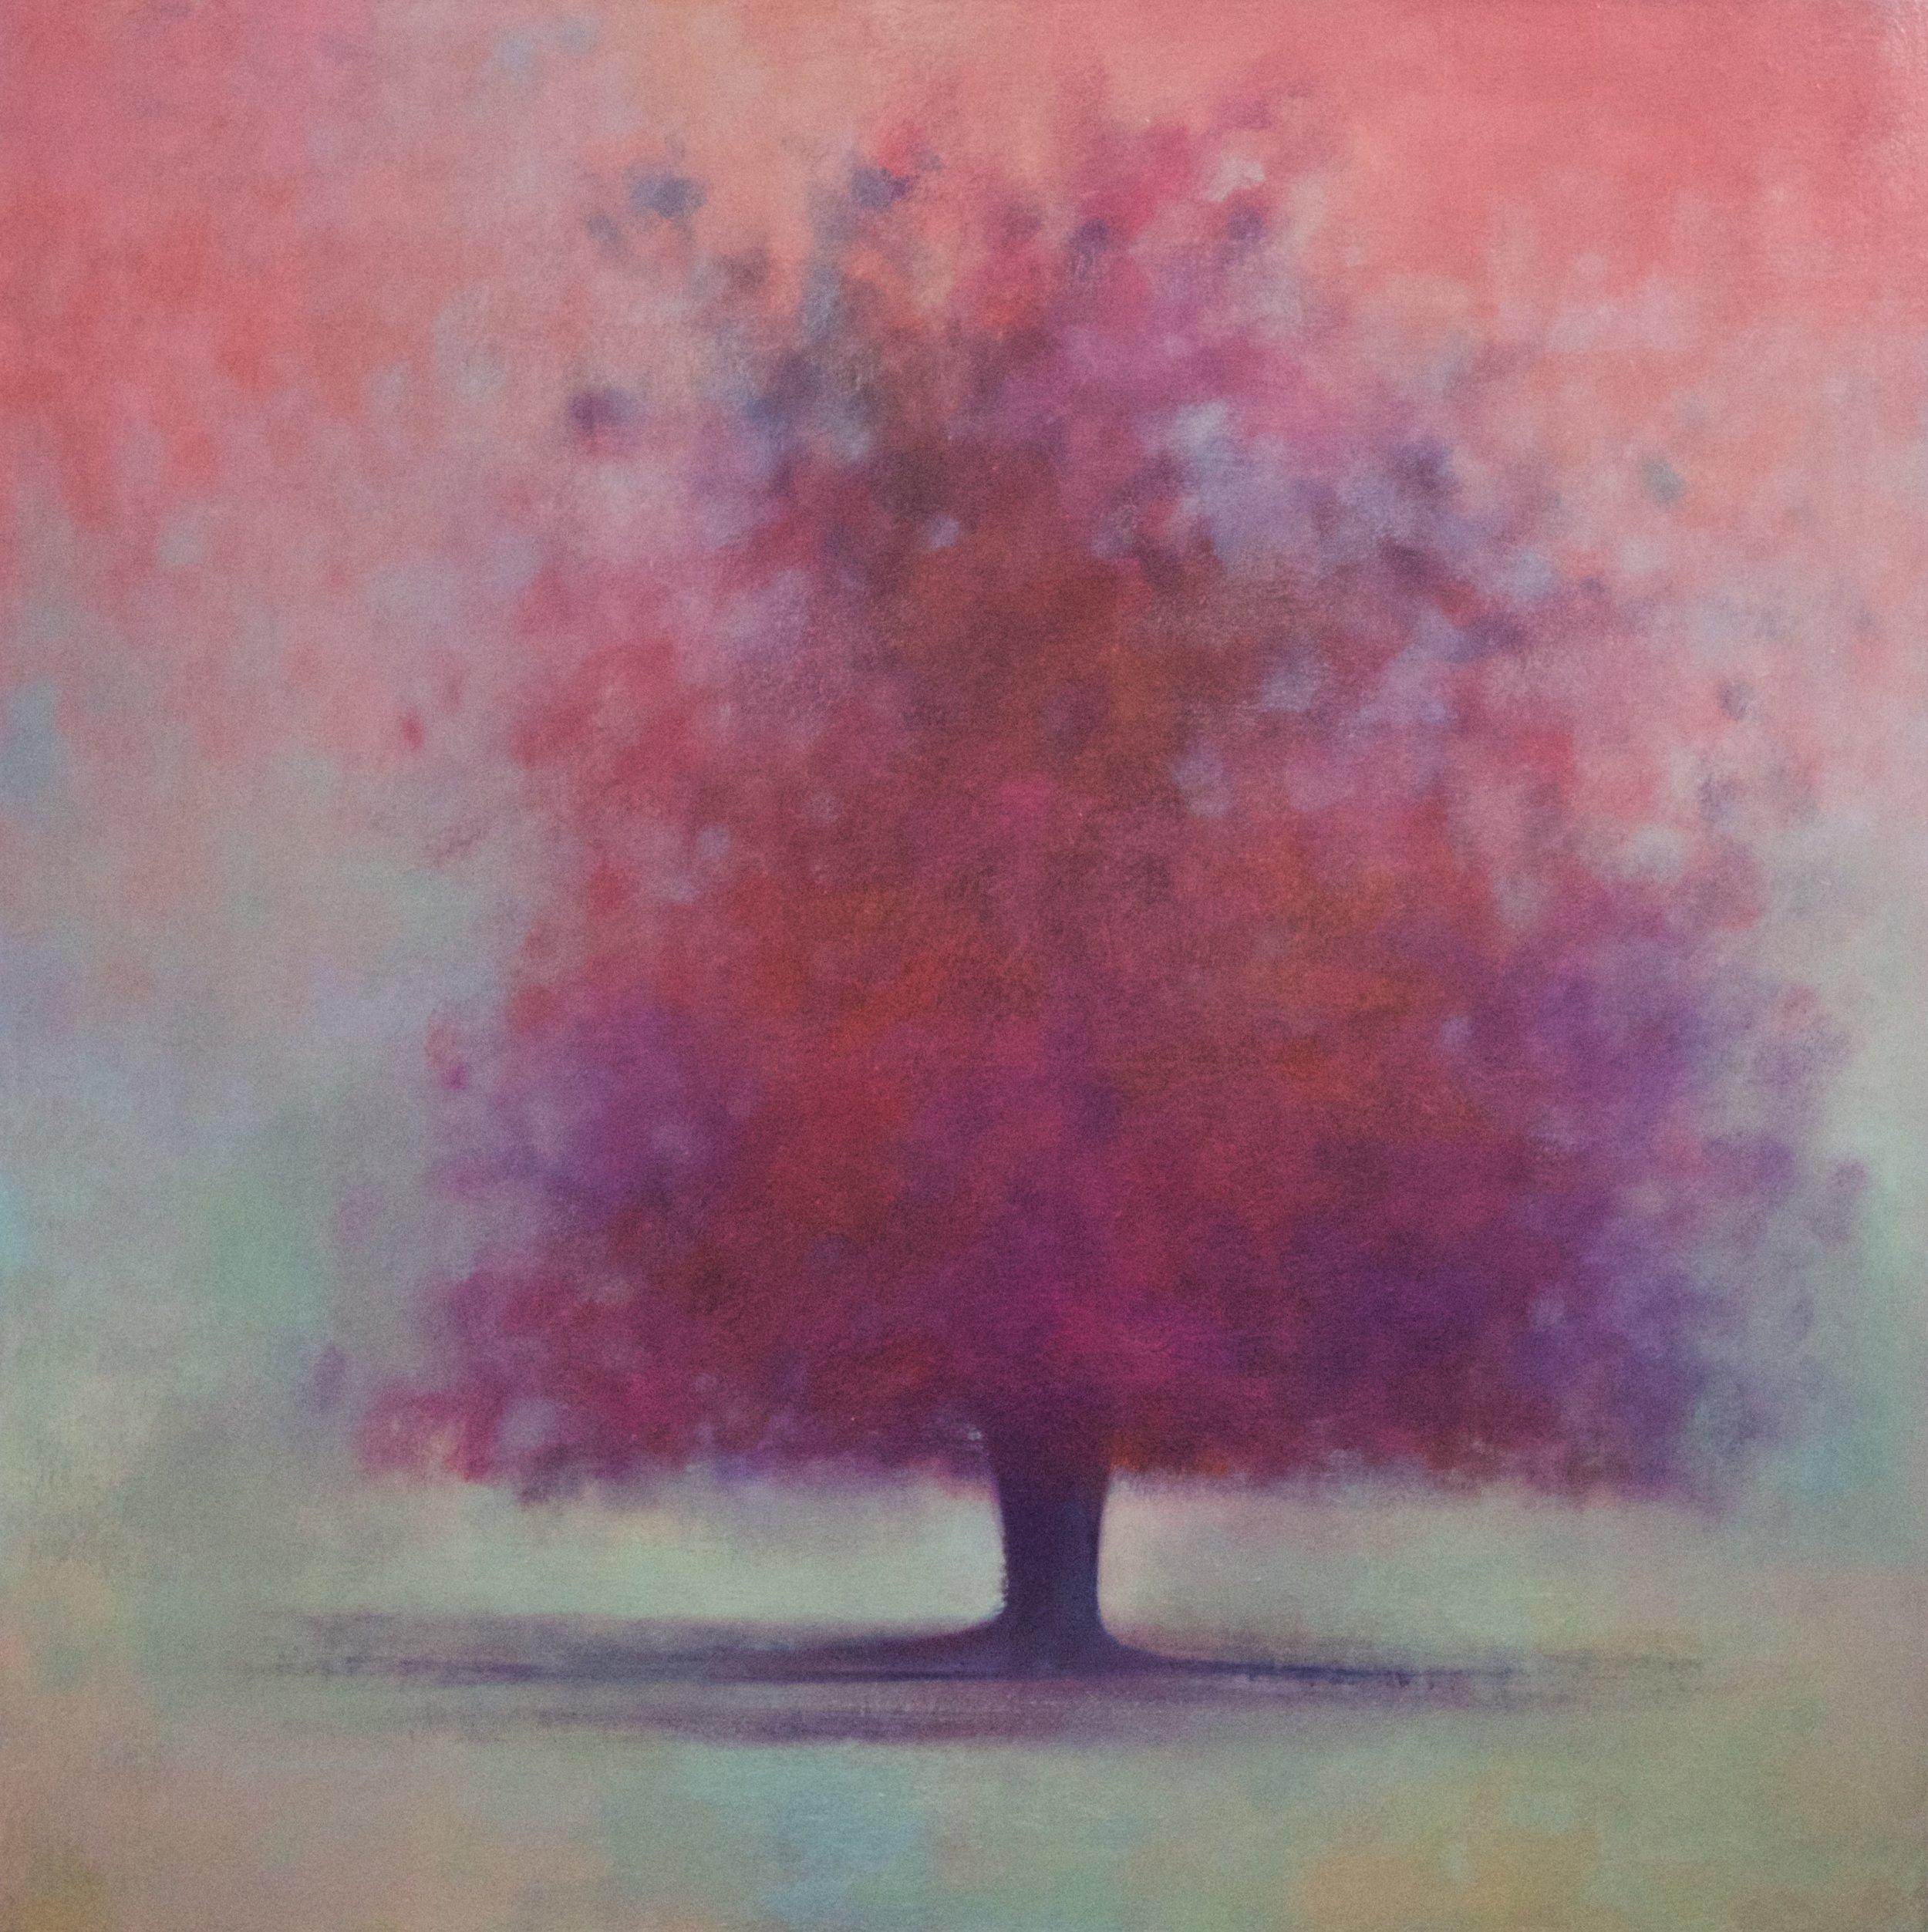 Title: Scarlett Flourish Size: 86 x 86 cm Medium: Oil on canvas Price: £2225